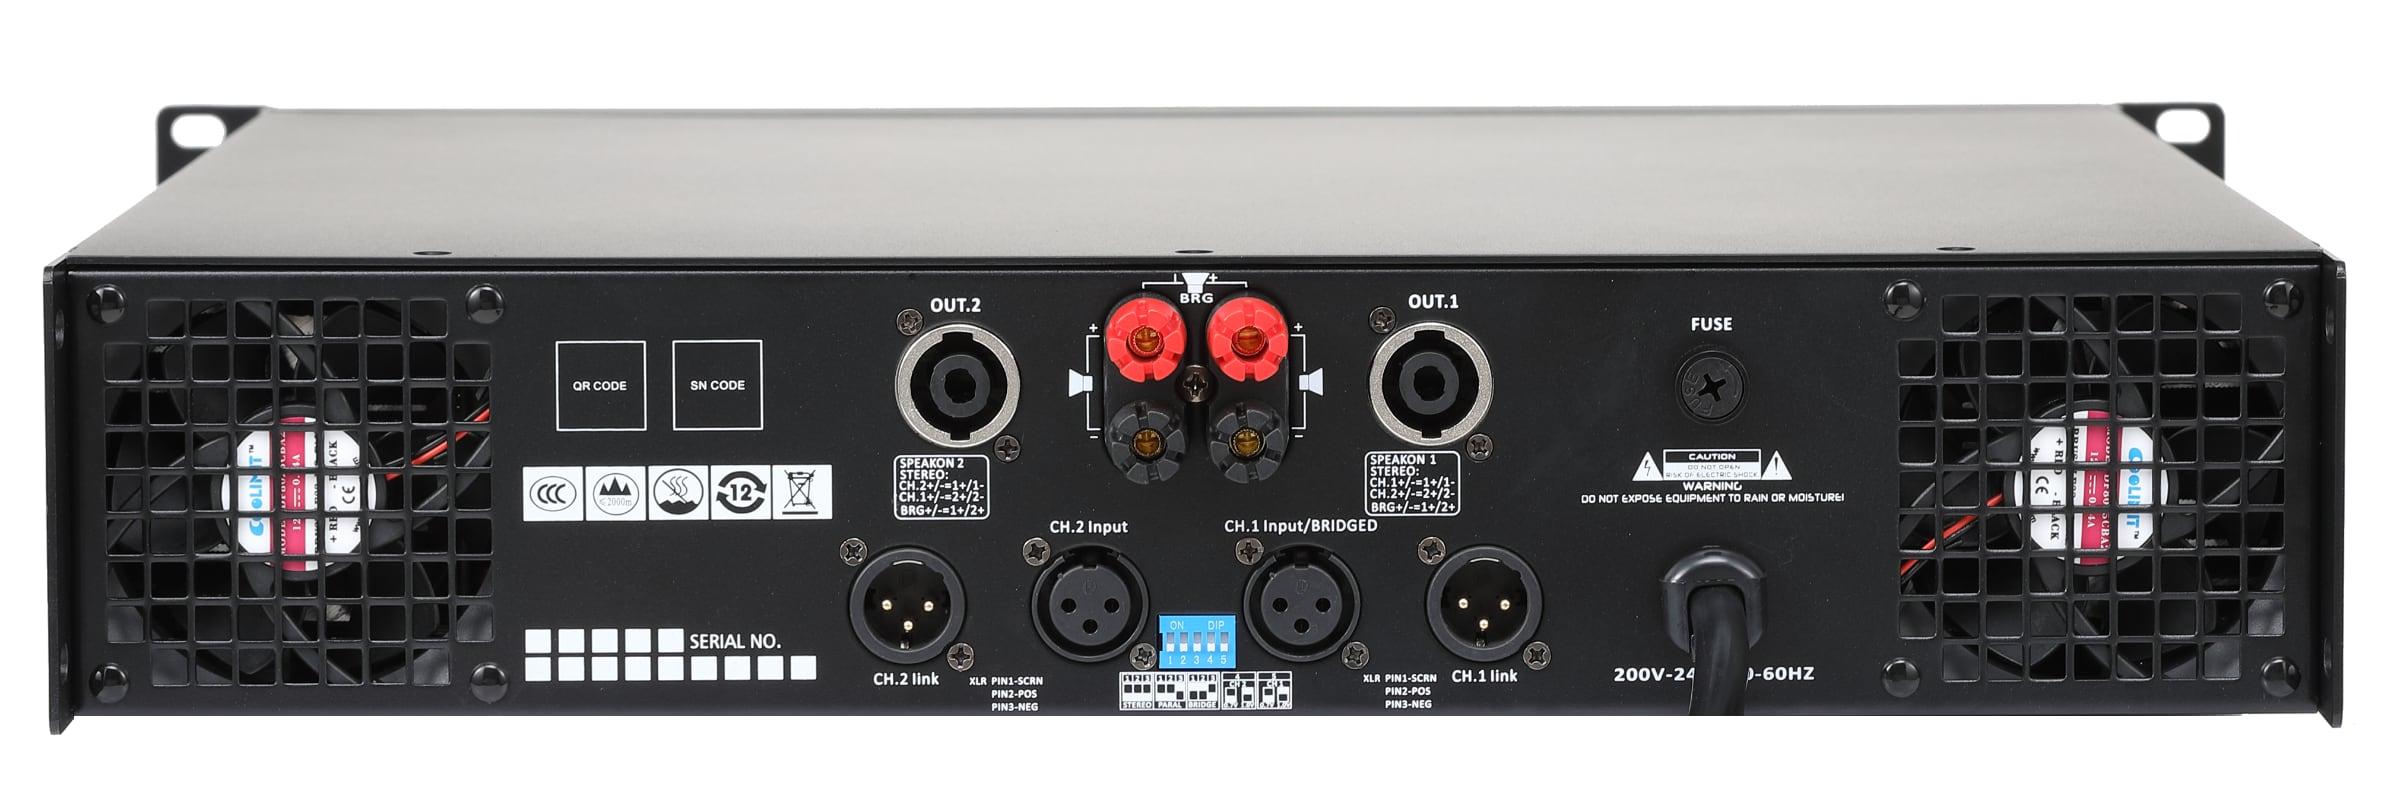 Công suất AAP SU-2600